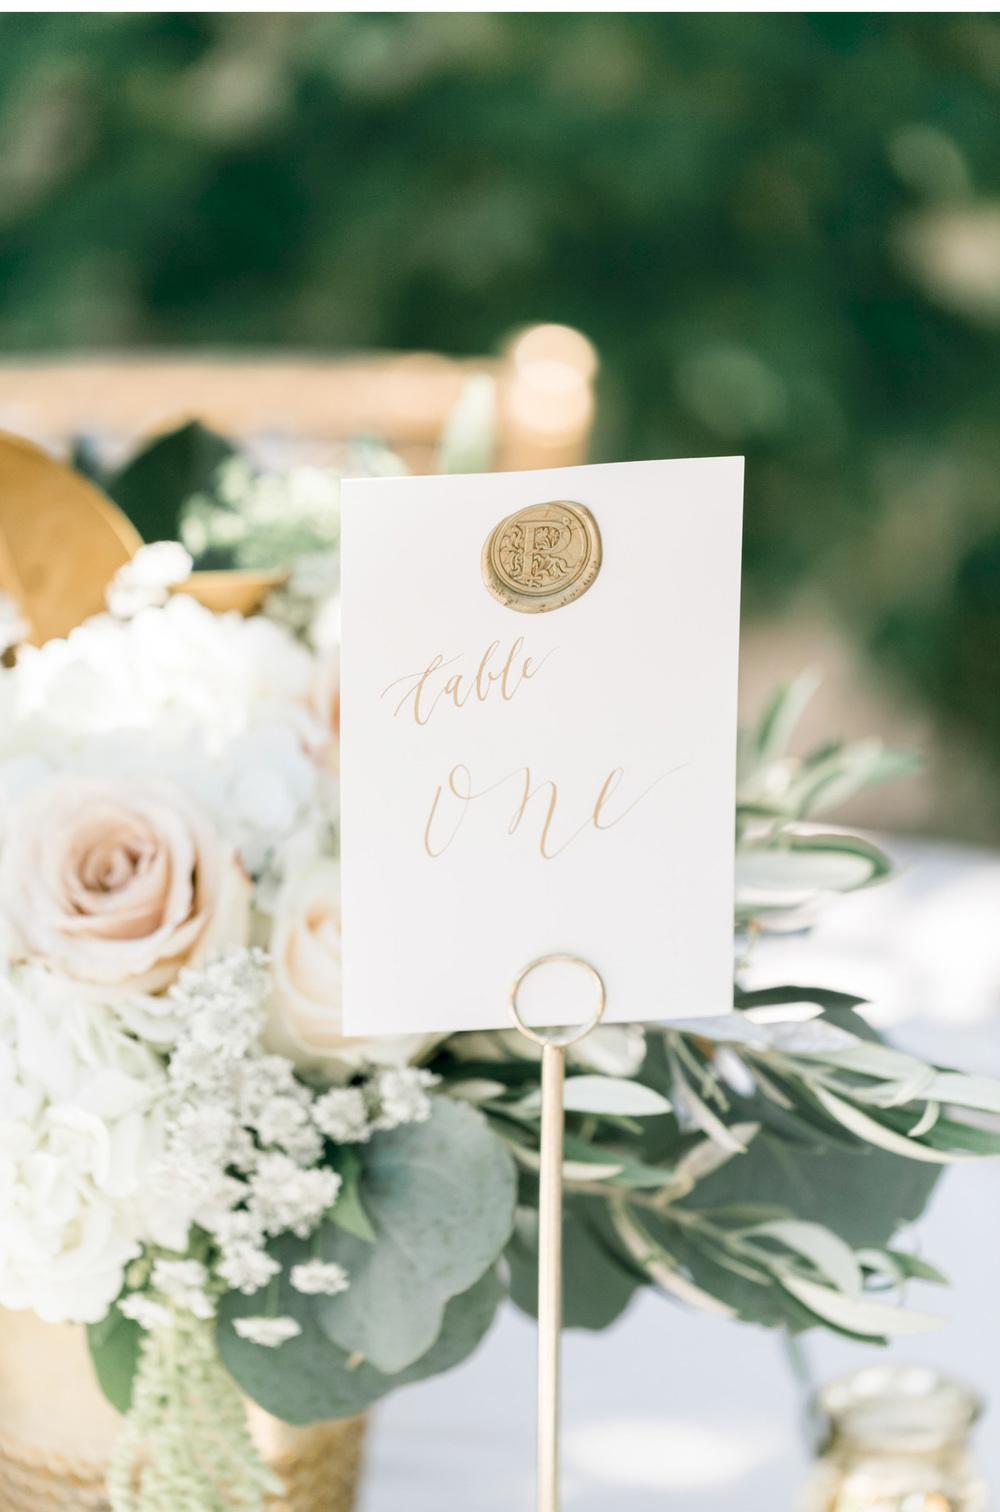 Style-Me-Pretty-Mission-San-Juan-Capistrano-Wedding-Natalie-Schutt-Photography_04.jpg